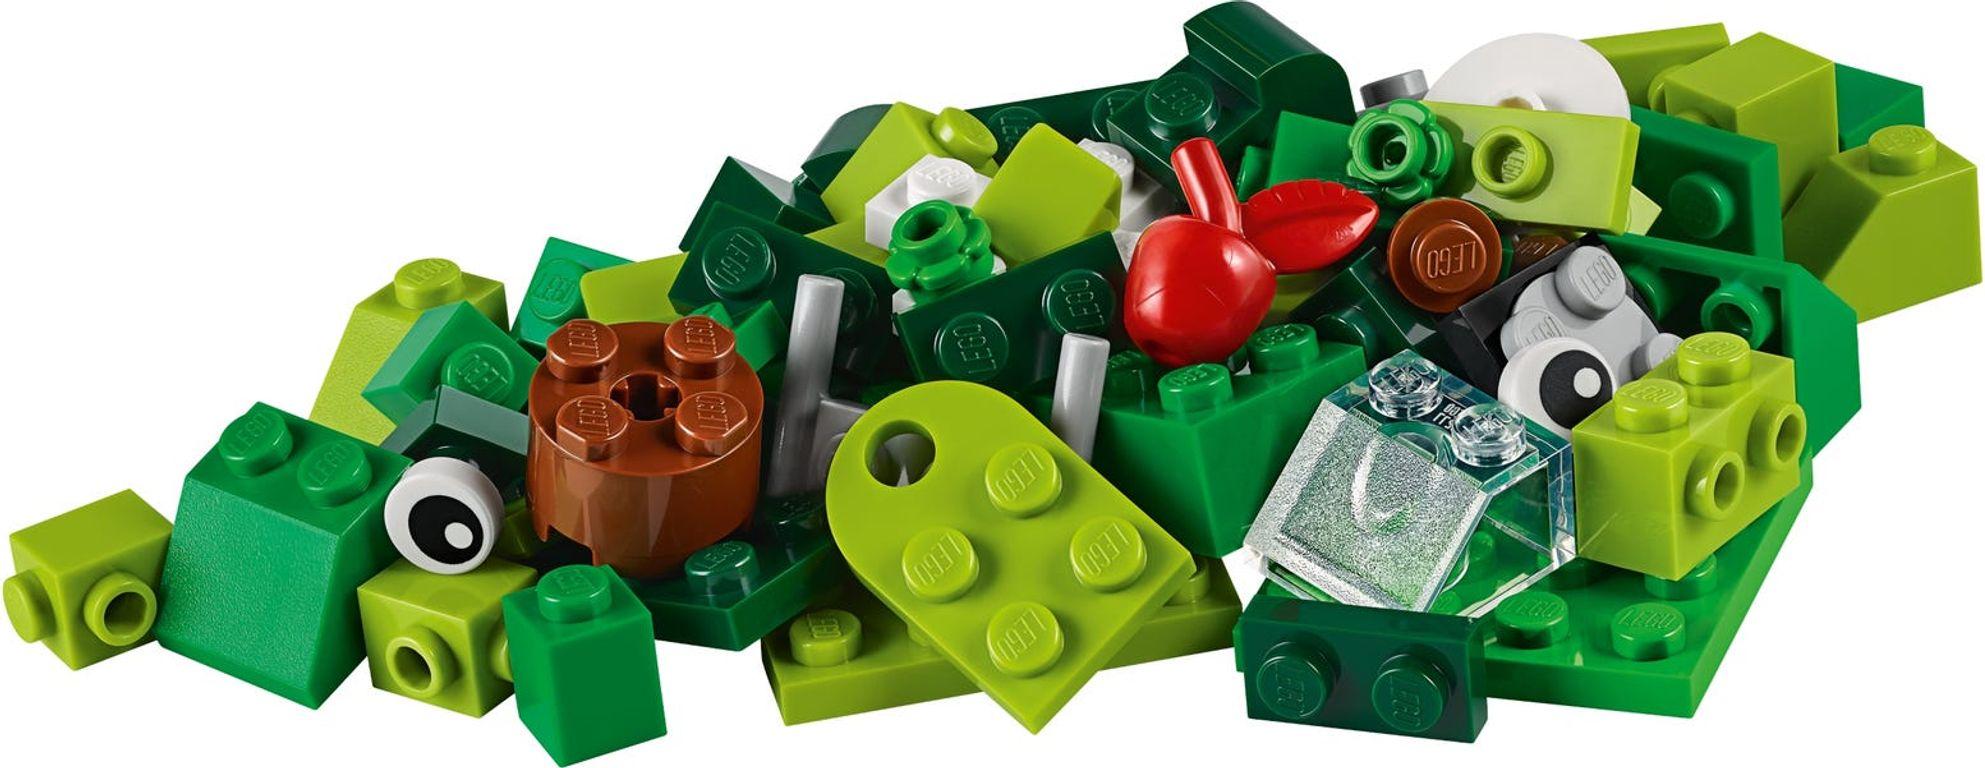 LEGO® Classic Creative Green Bricks components